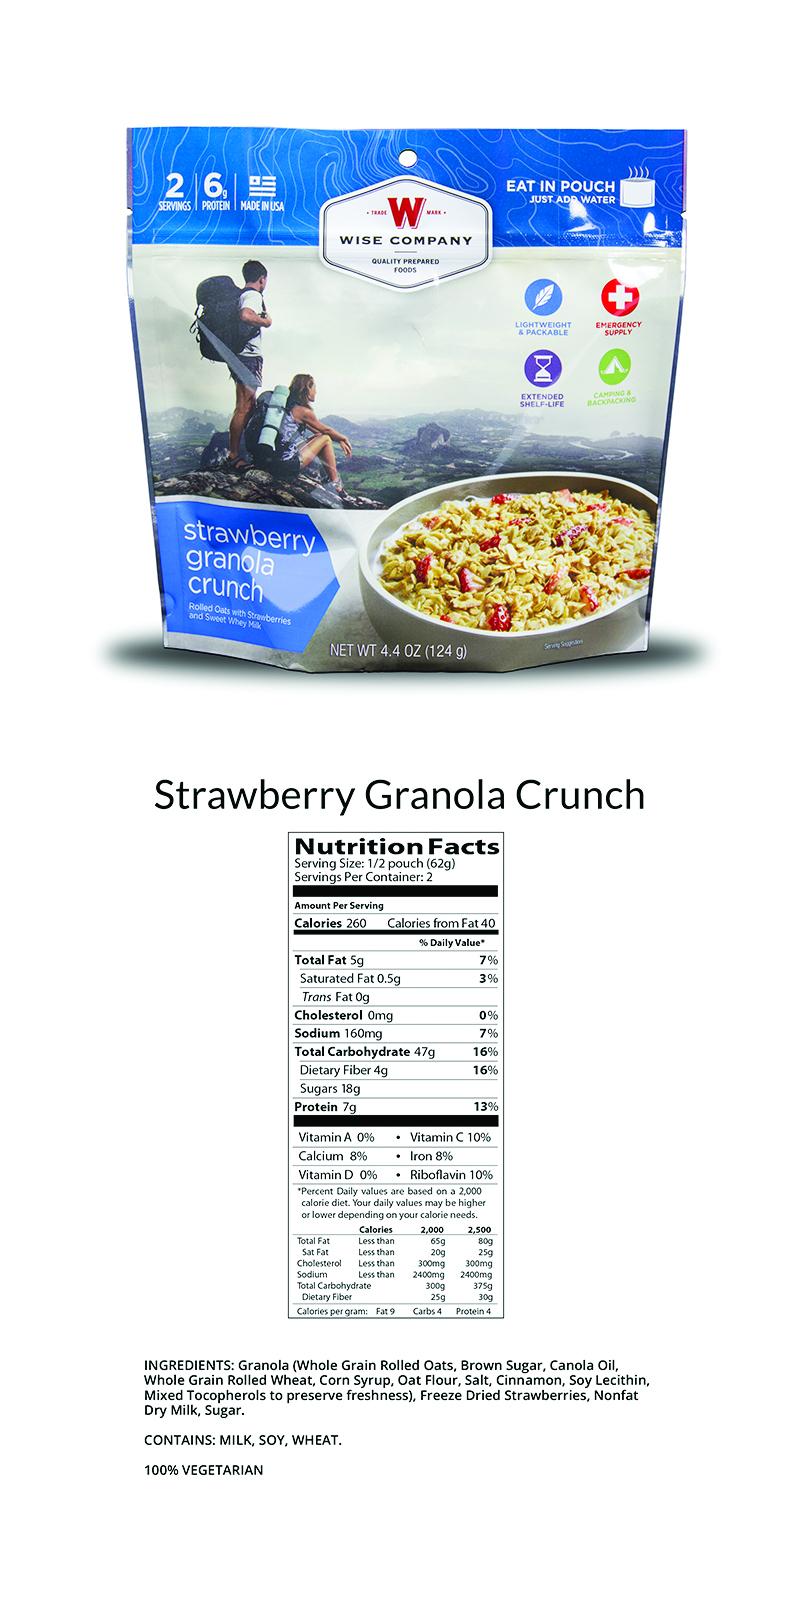 Strawberry Granola Crunch